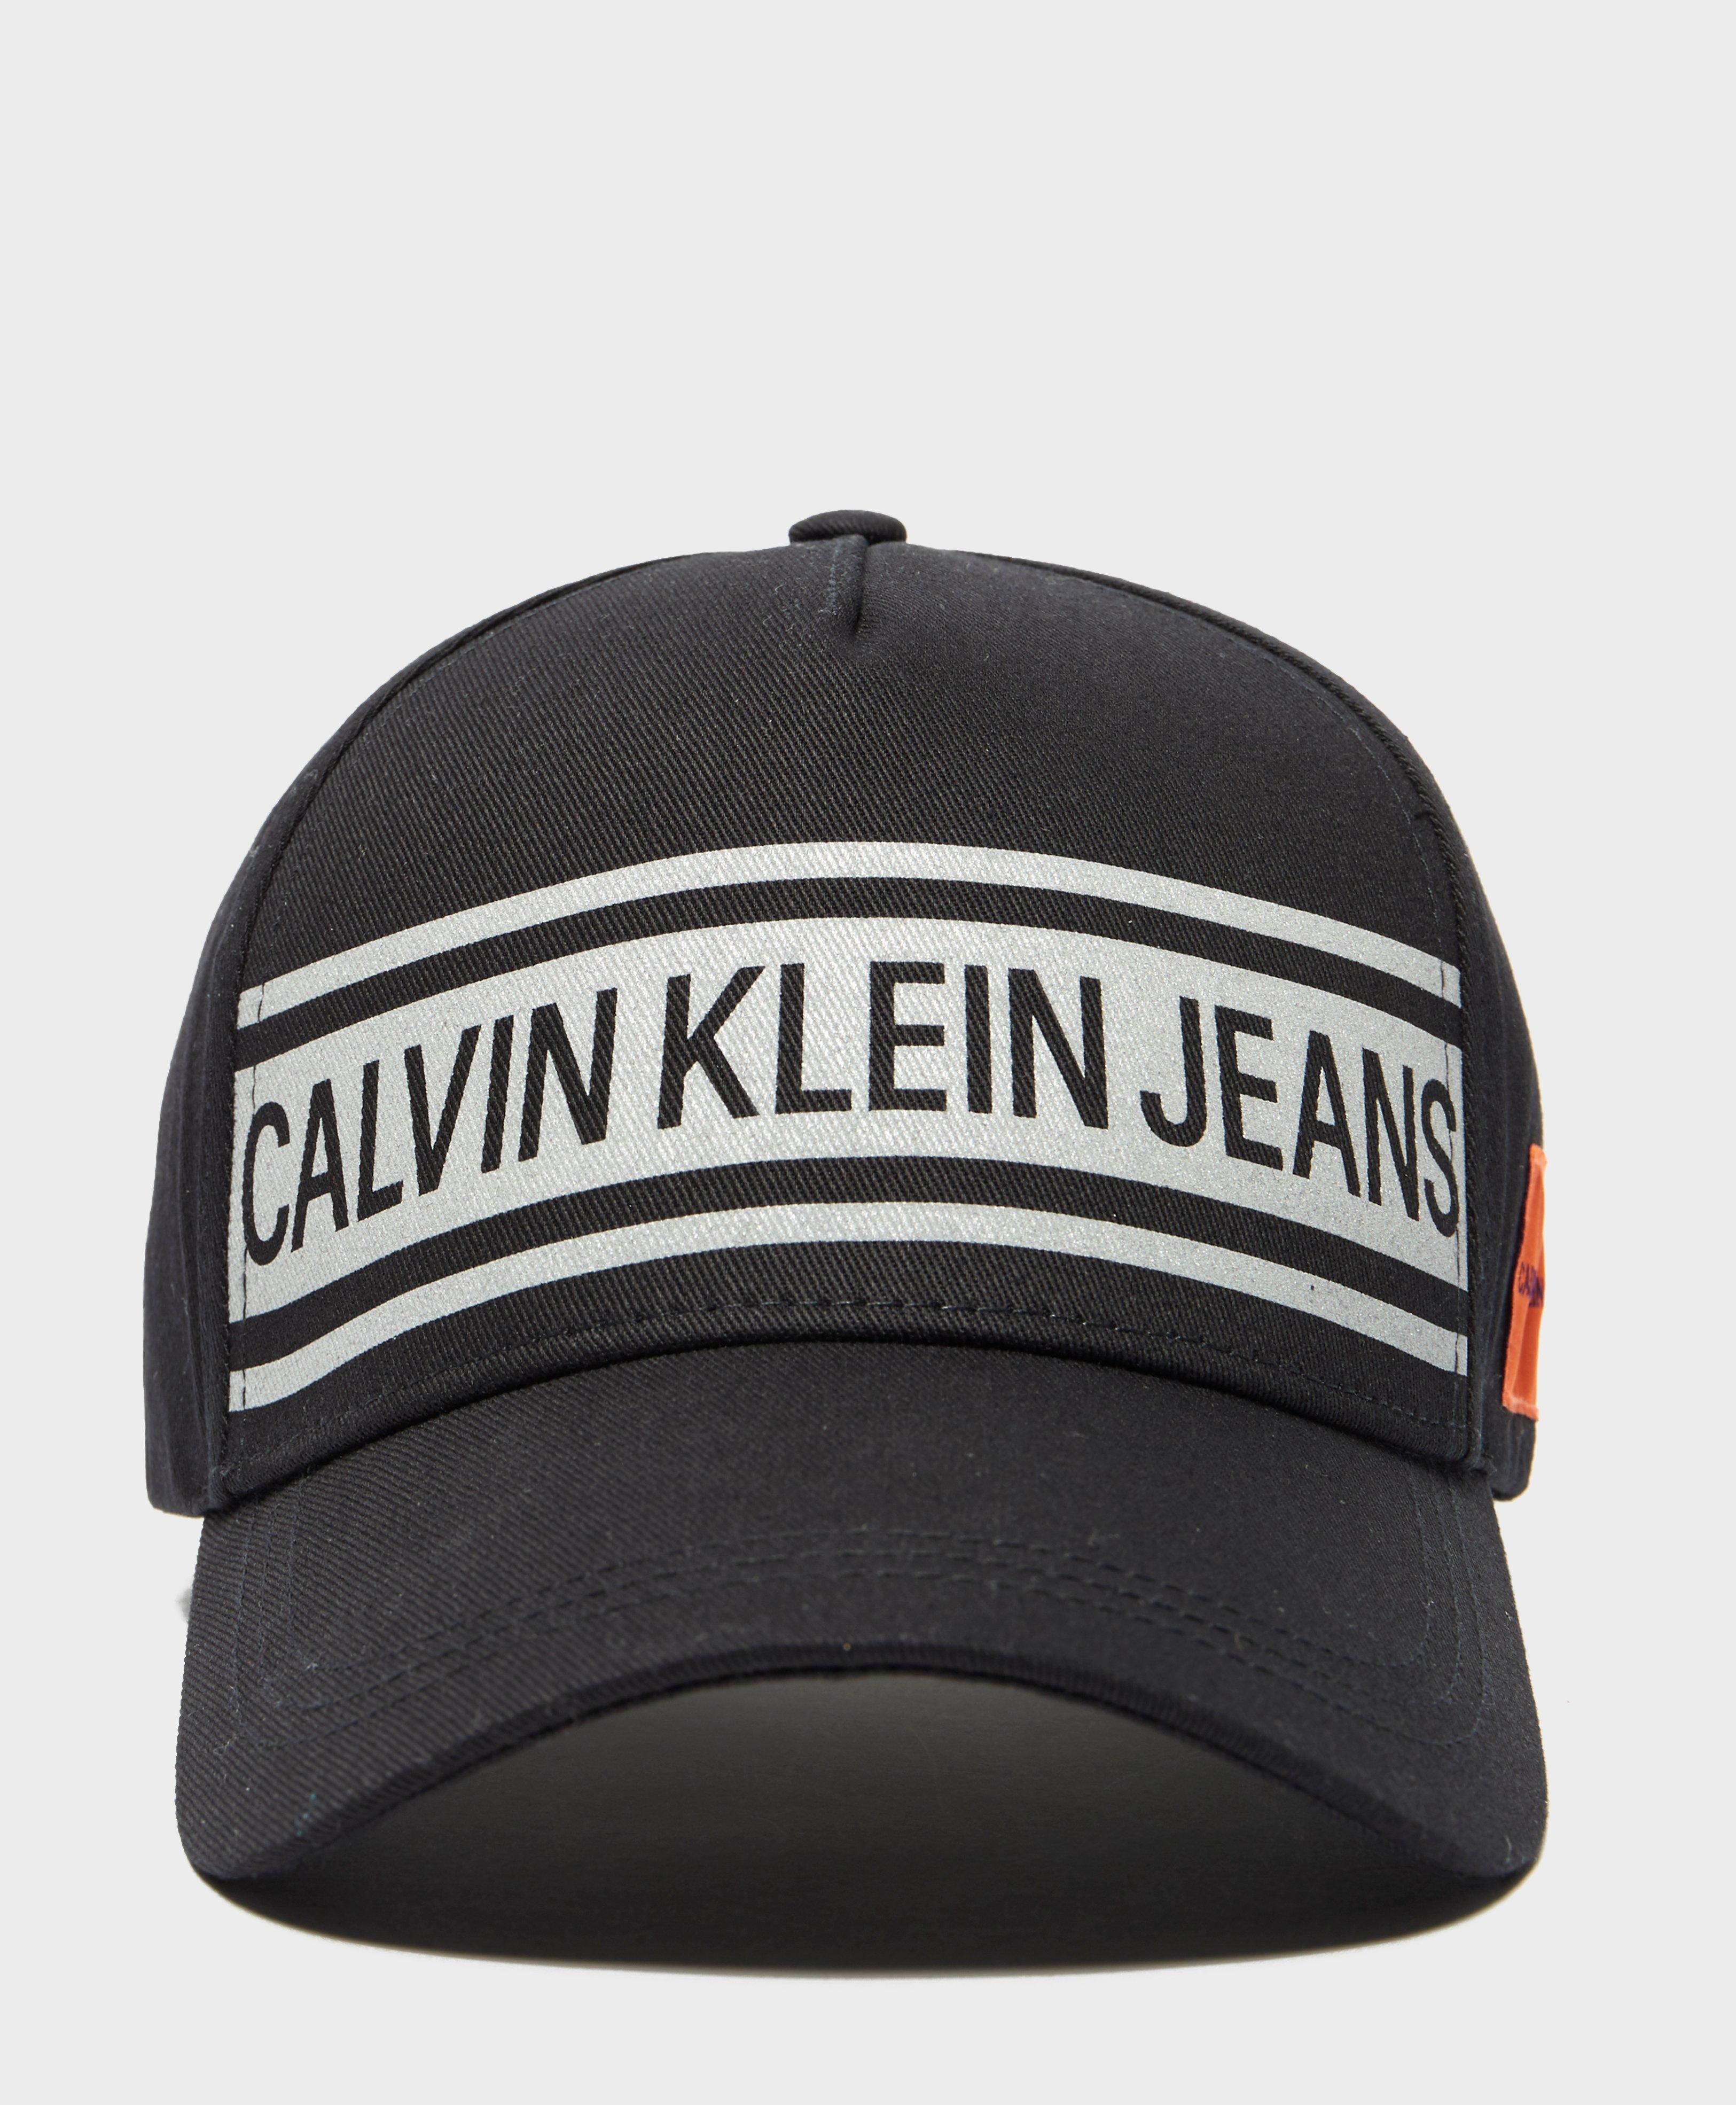 83578f802da Lyst - Calvin Klein Reflective Cap in Black for Men